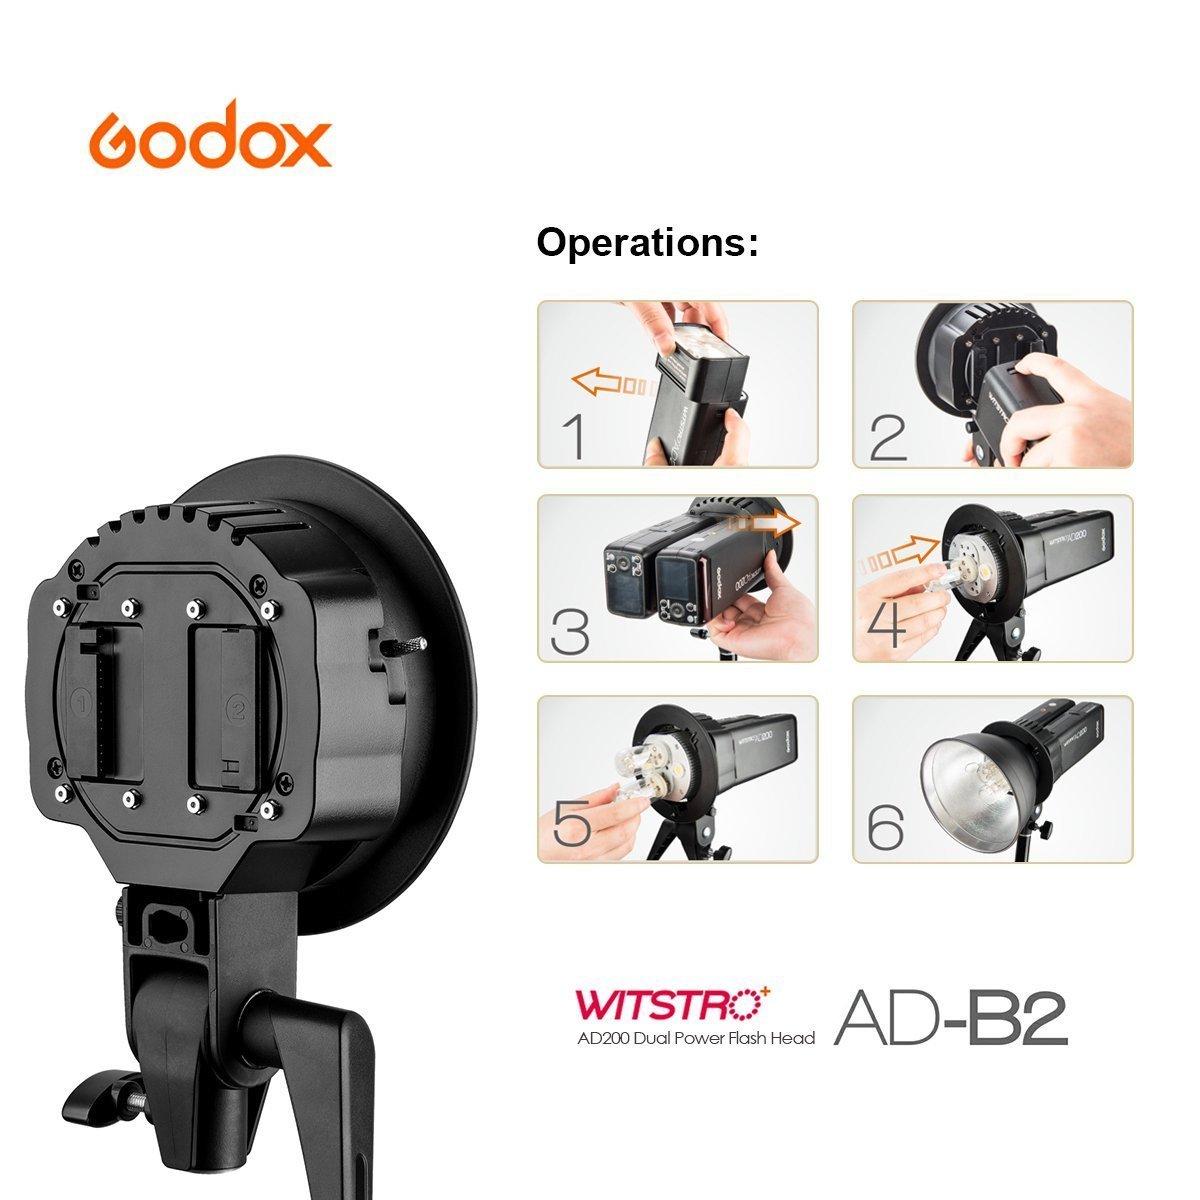 Godox AD-B2 Dual Tubes Light Head S-Type Bowens Mount Flash Light Head Holder Bracket for Godox AD200 Speedlite Ahieve 400W Power Output+CONXTRUE USB LED